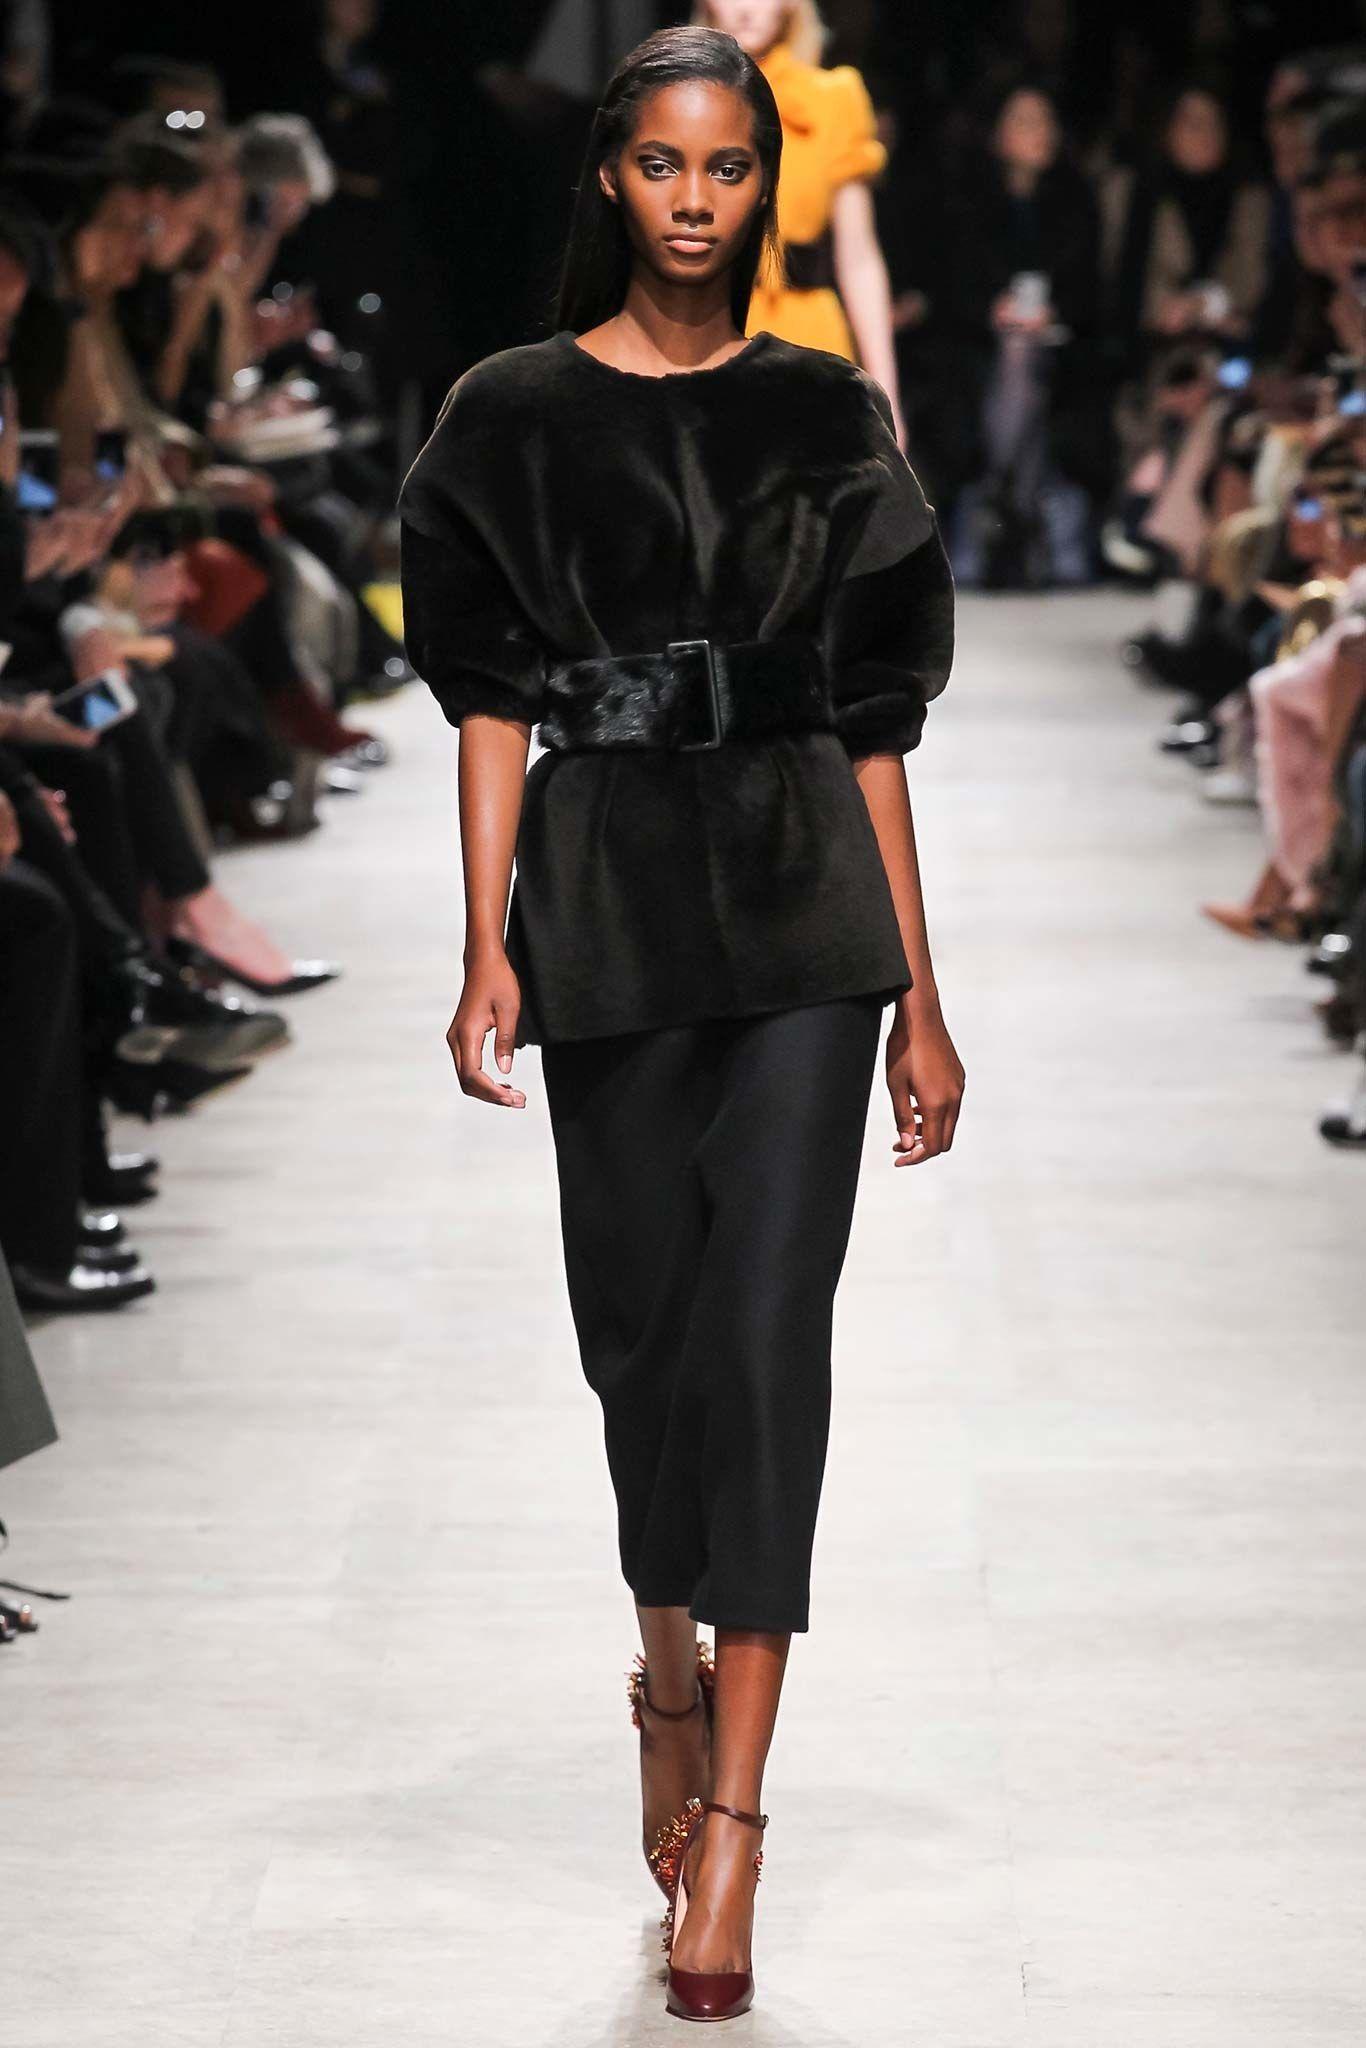 Rochas Fall 2015 Ready-to-Wear Fashion Show - Tami Williams (Elite)